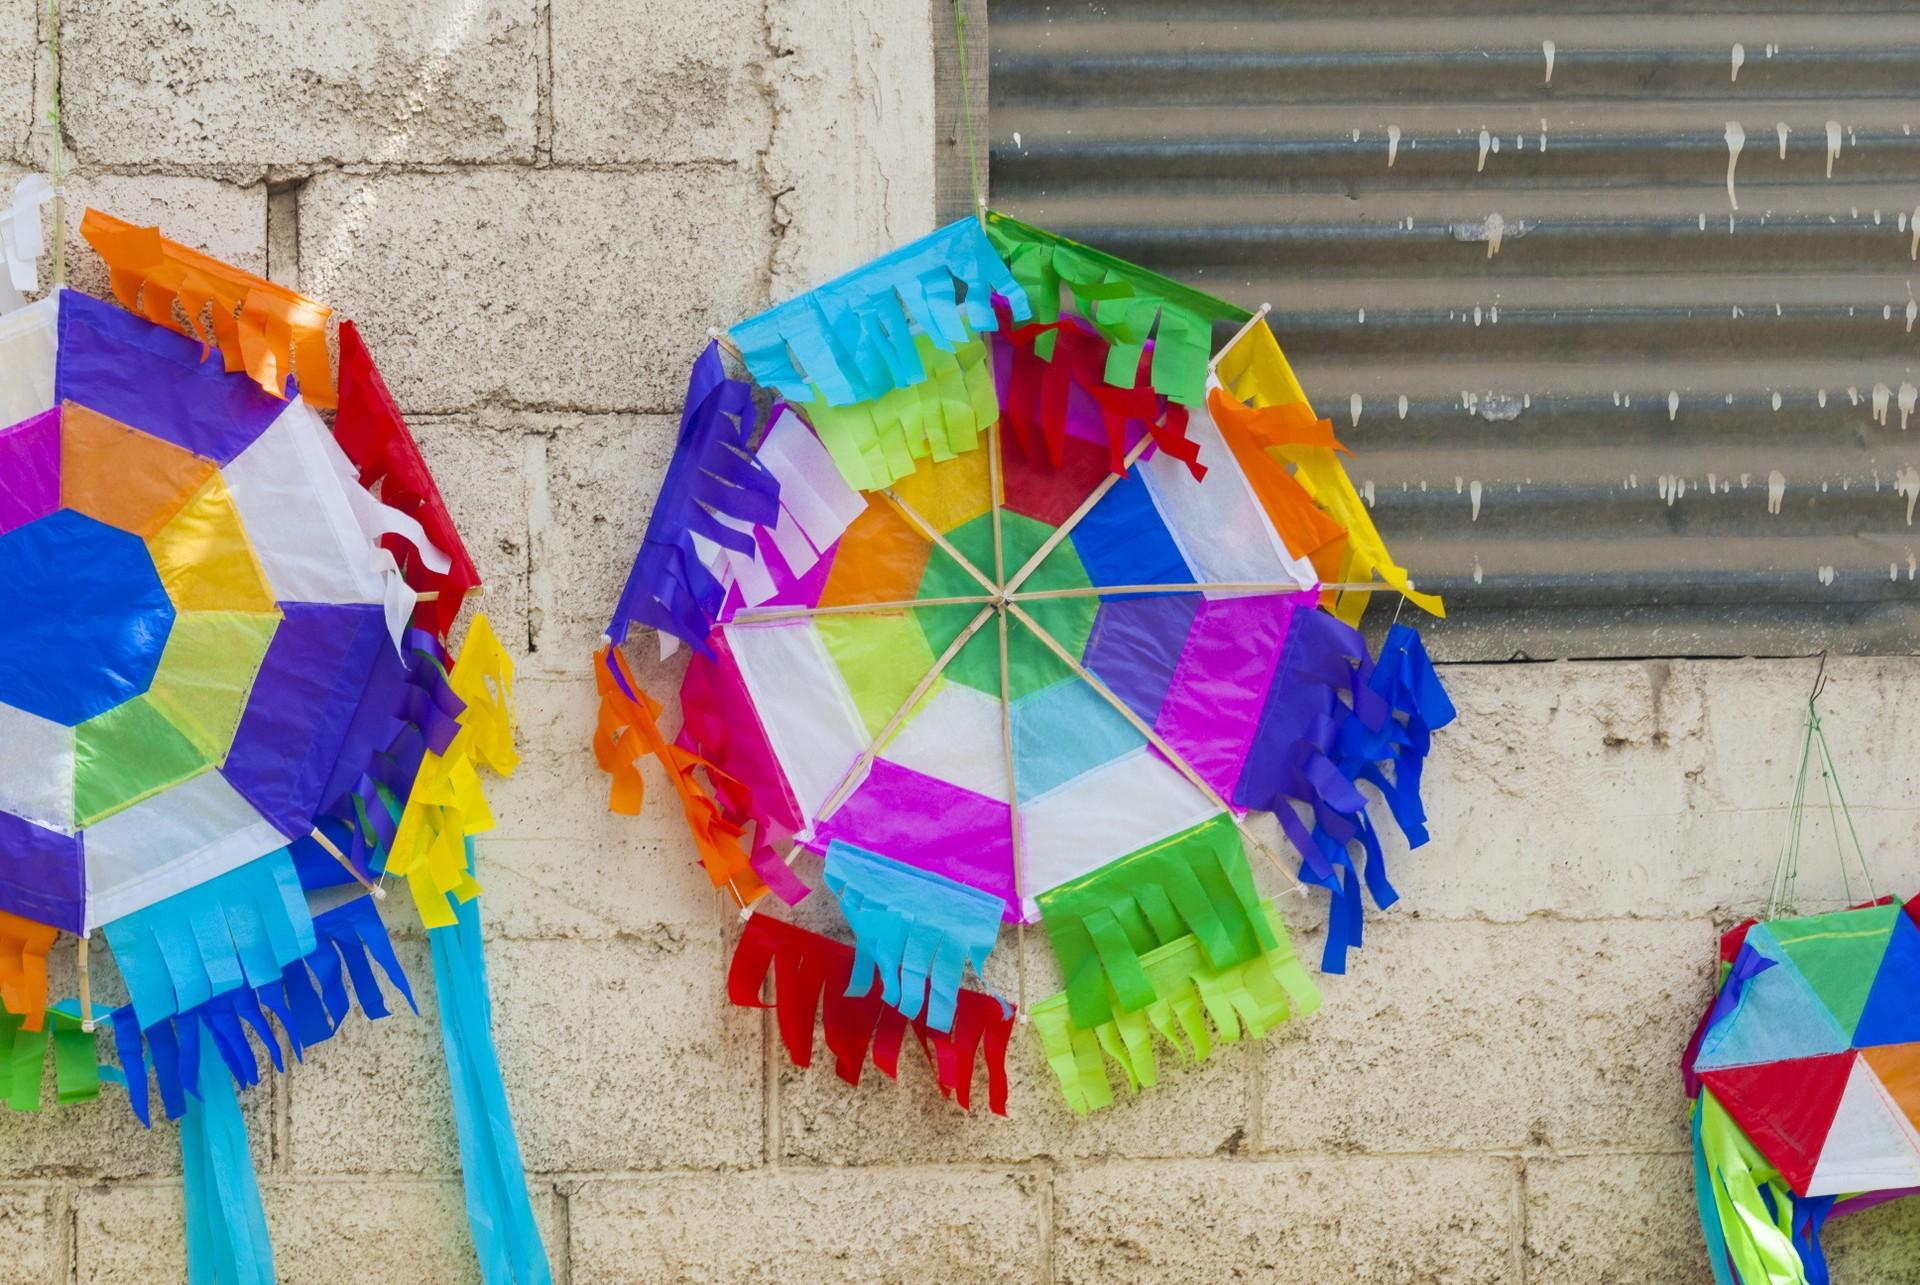 Kites lining the walls in Guatemala